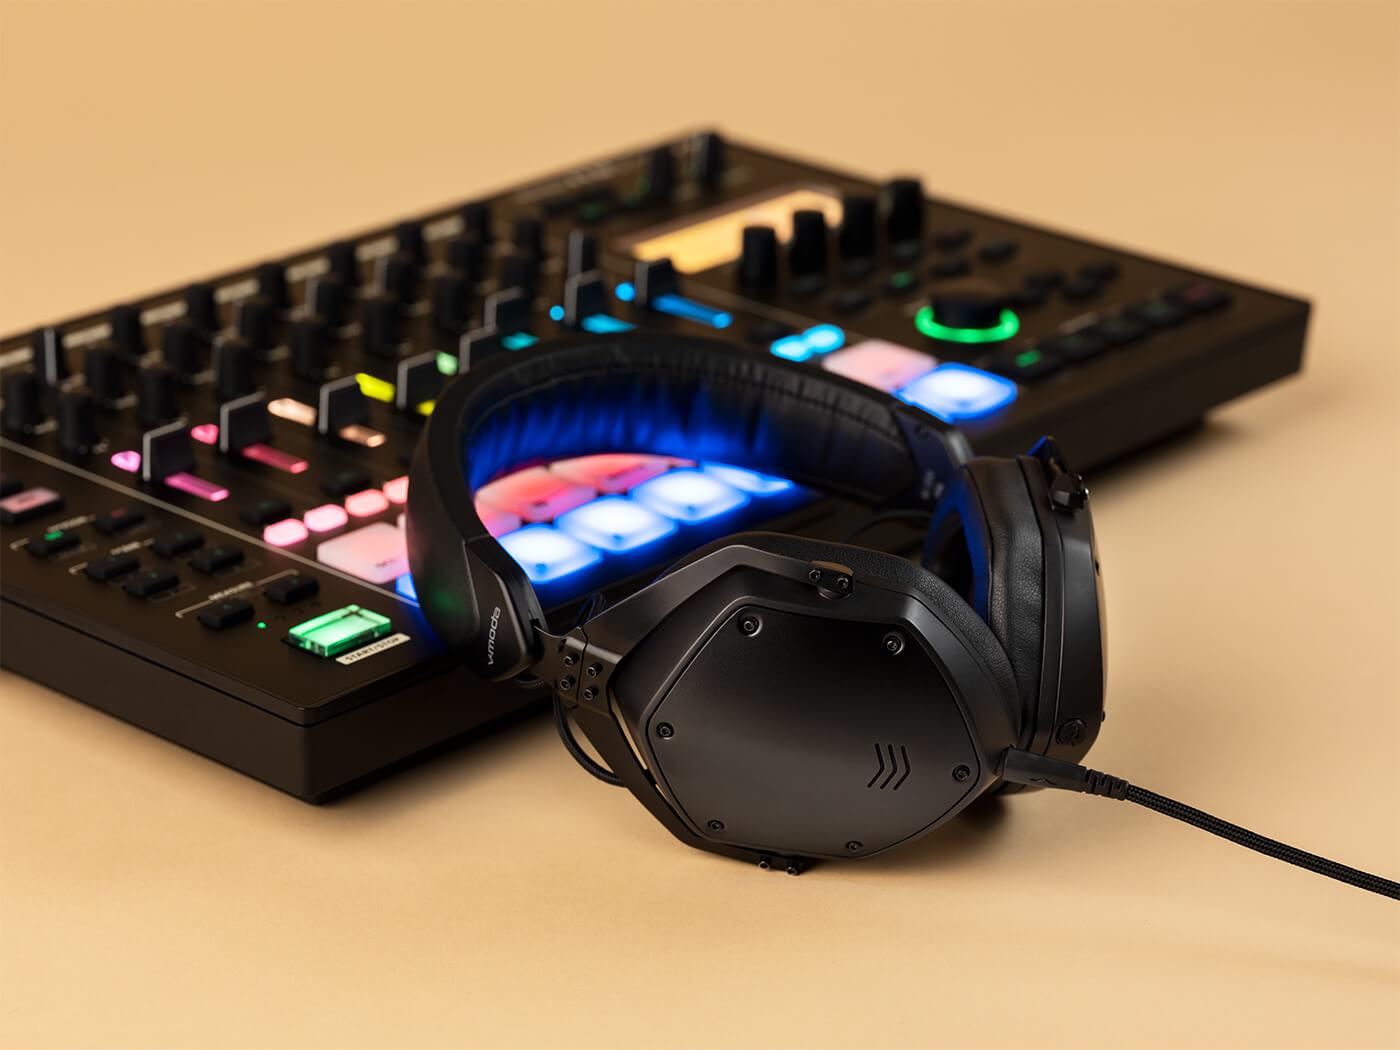 V-MODA M-200 headphones bring the brand into the studio